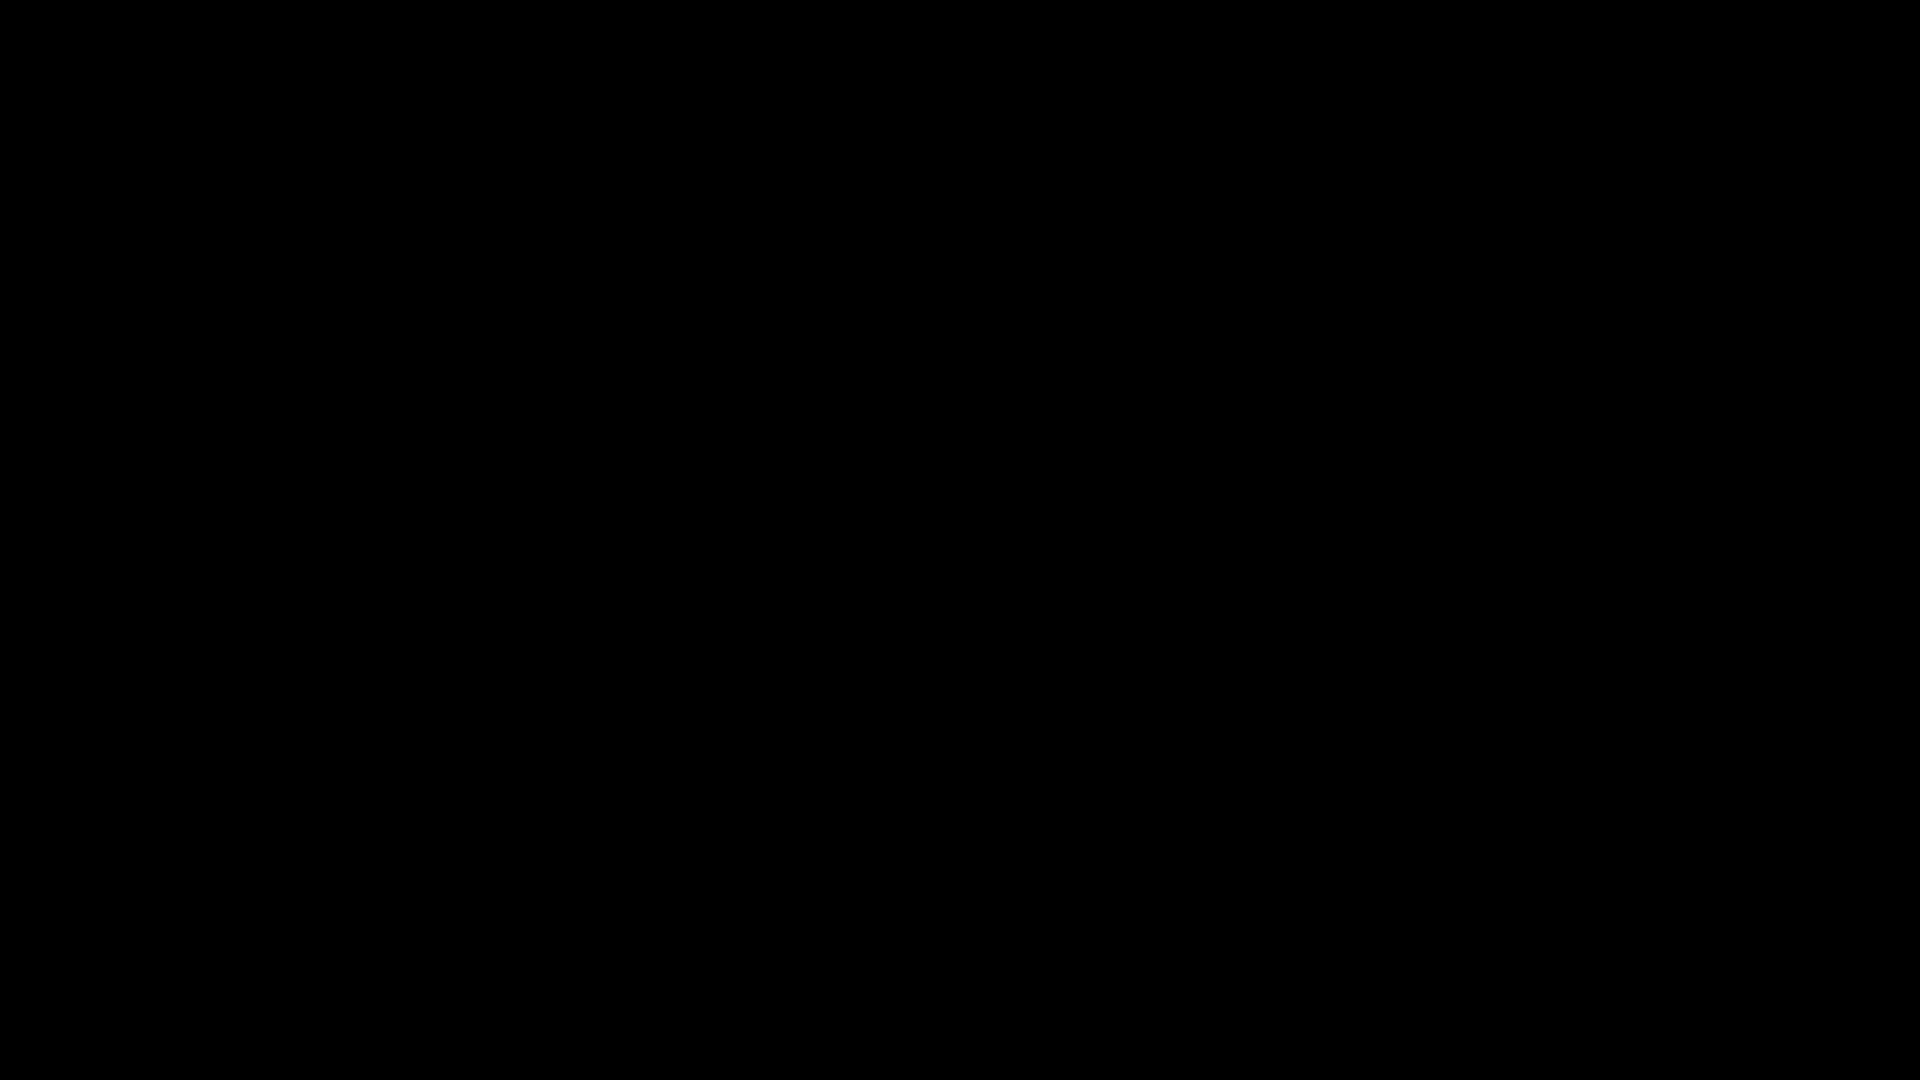 Spielerpräsentation Frühjahr 2017